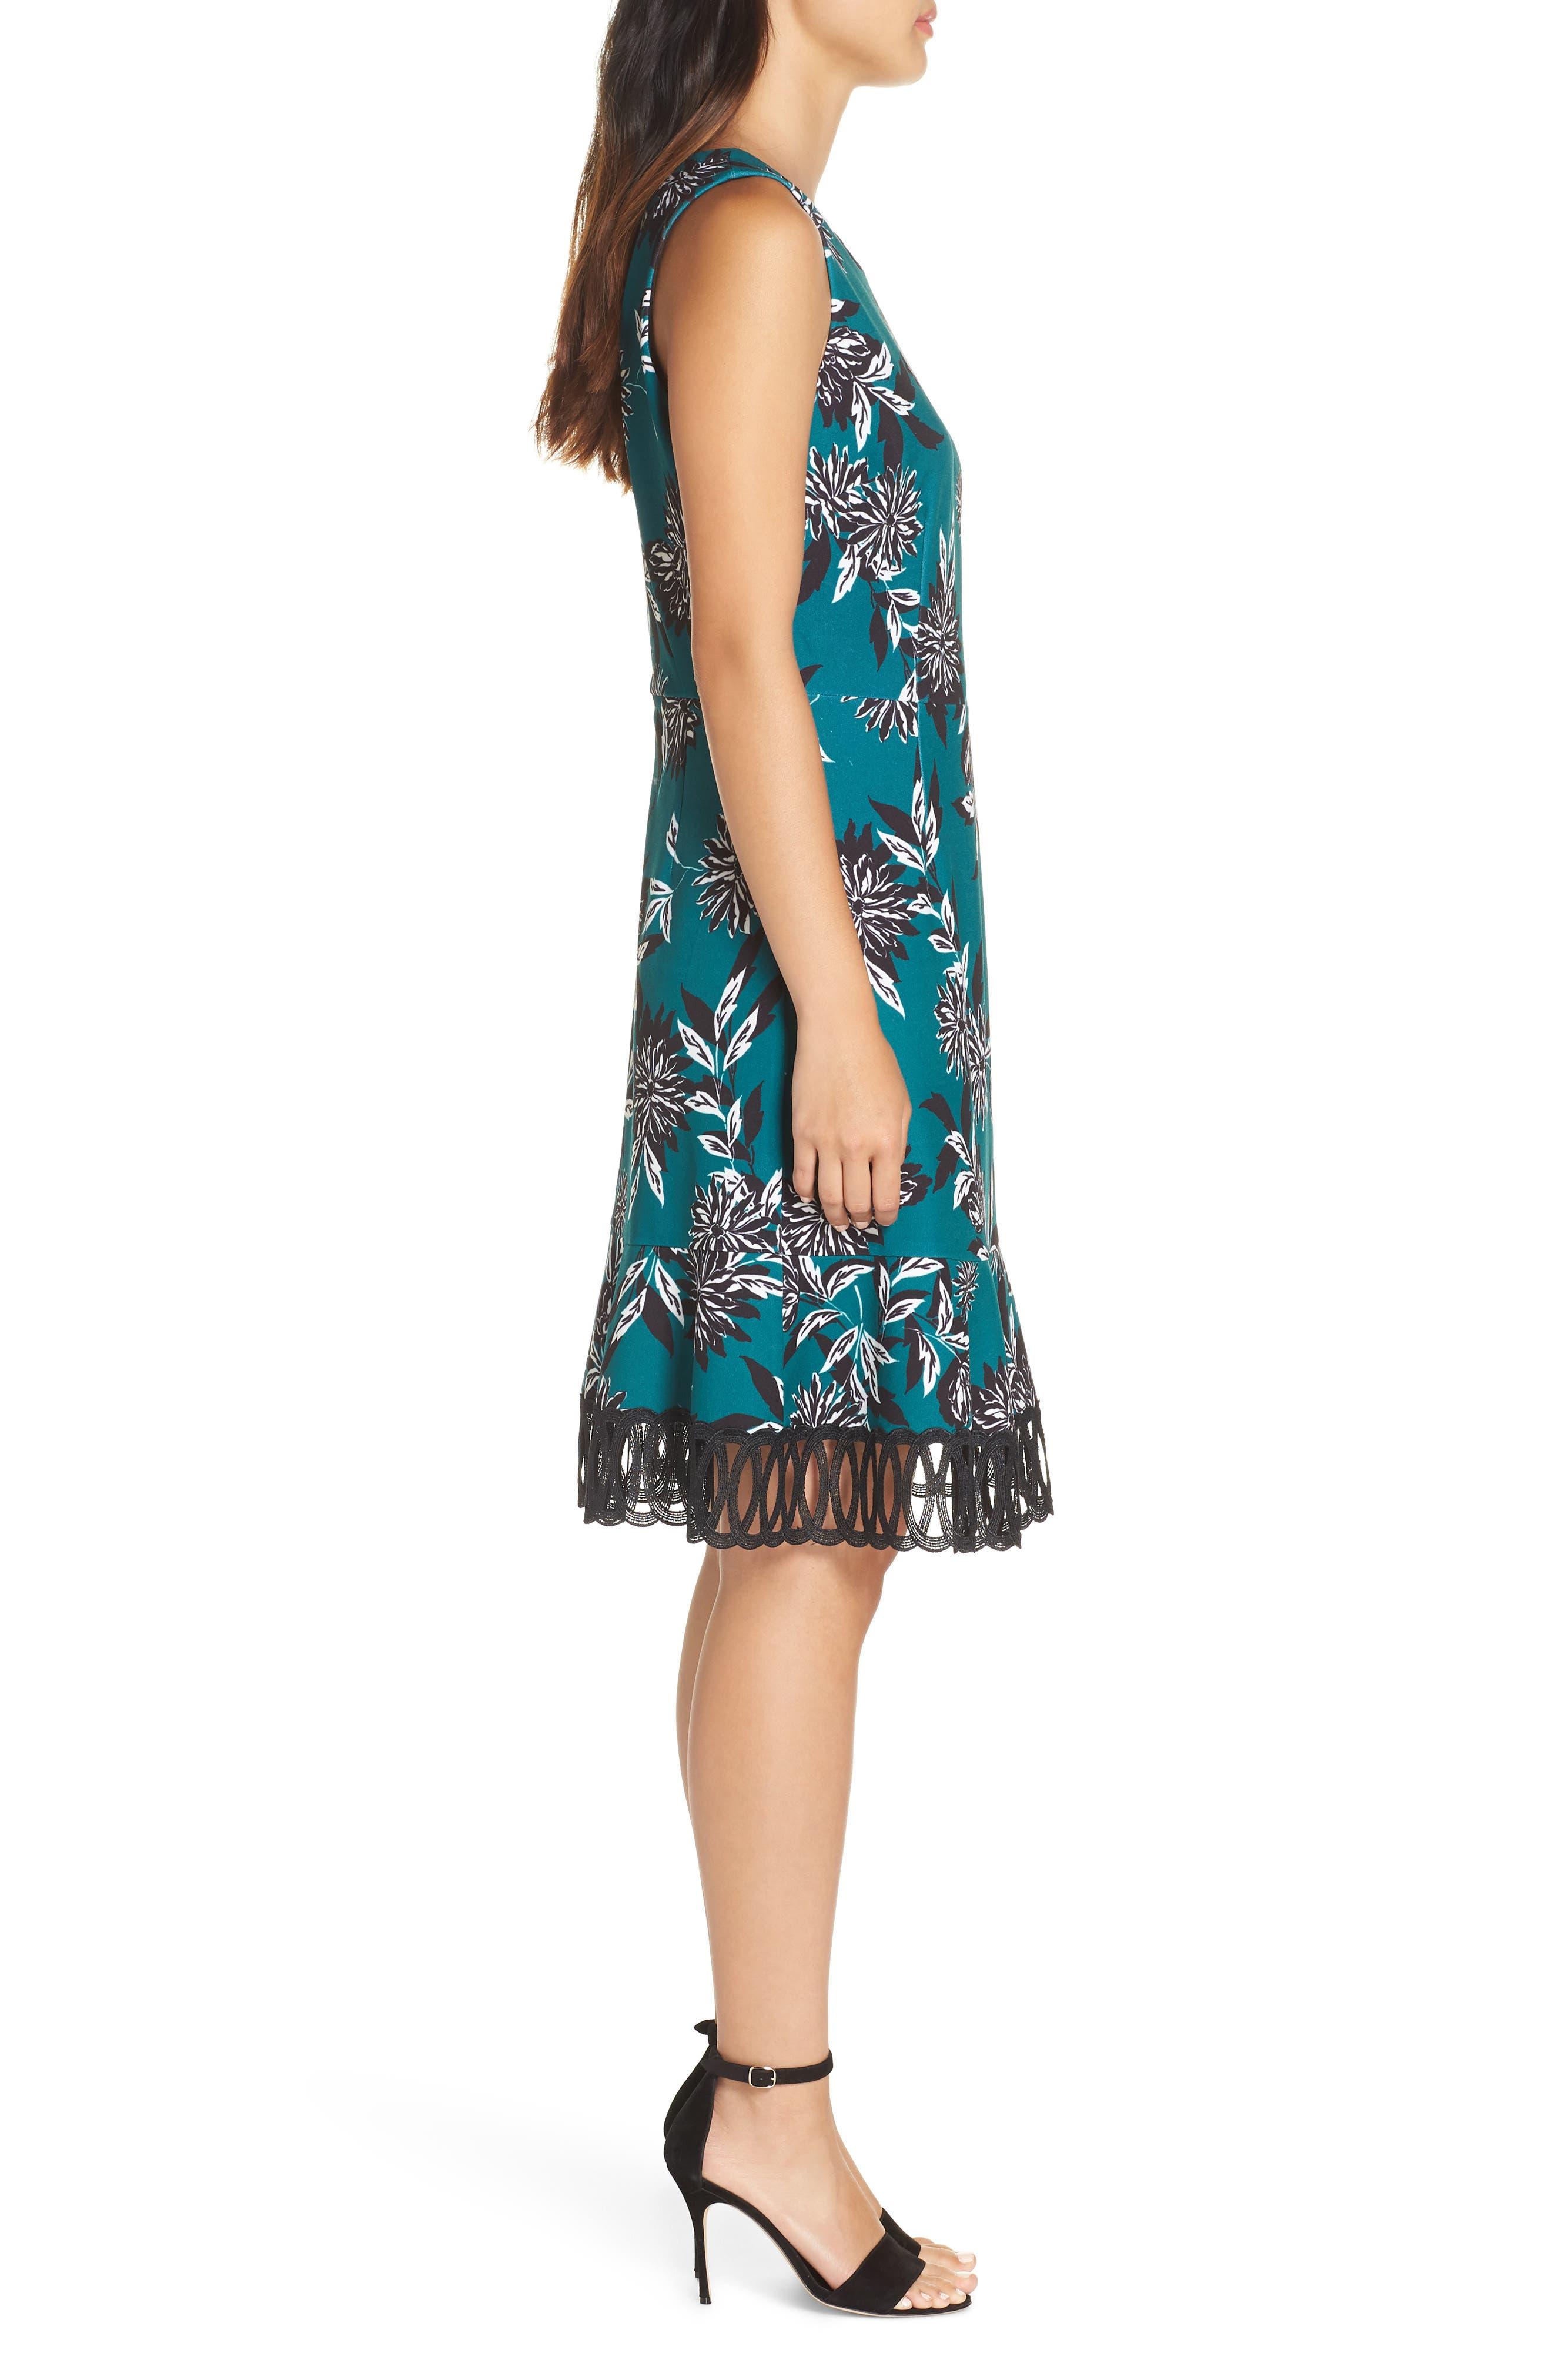 JULIA JORDAN, Crepe Scuba A-Line Dress, Alternate thumbnail 4, color, 300